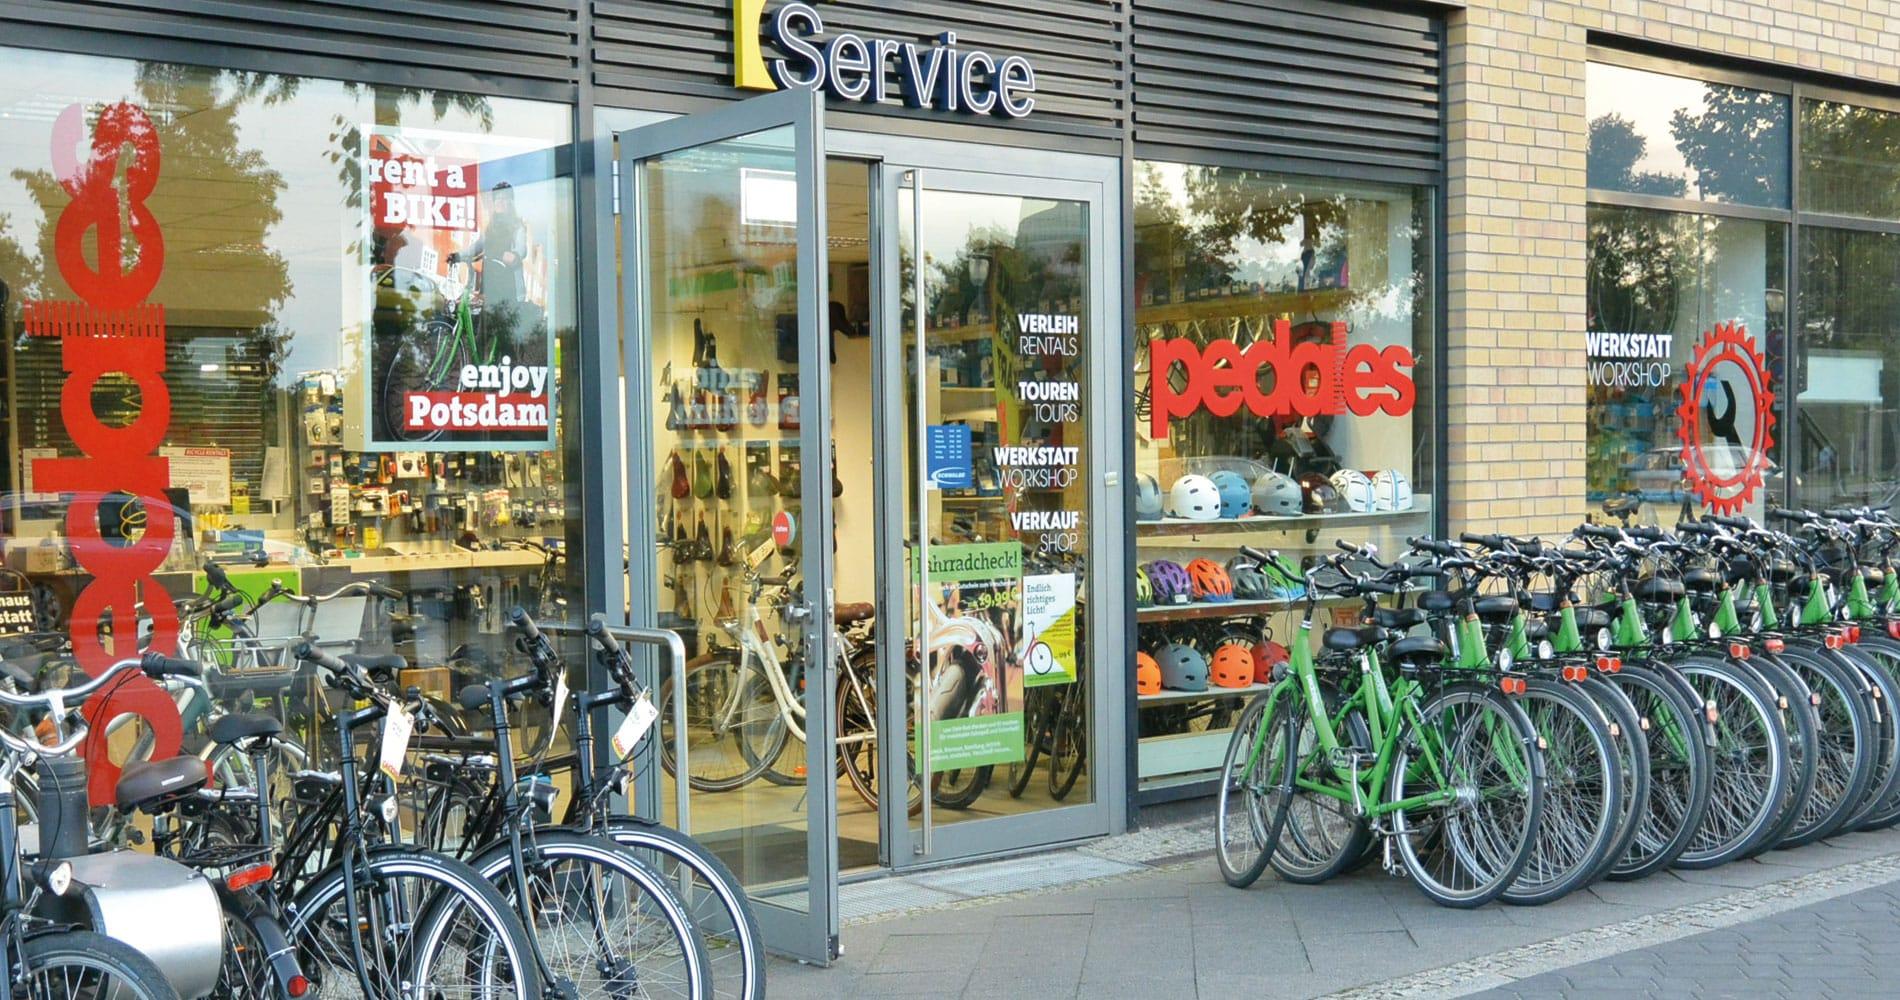 Fahrradverleih, Fahrrad-Werkstatt, Reparatur, Potsdam Hauptbahnhof